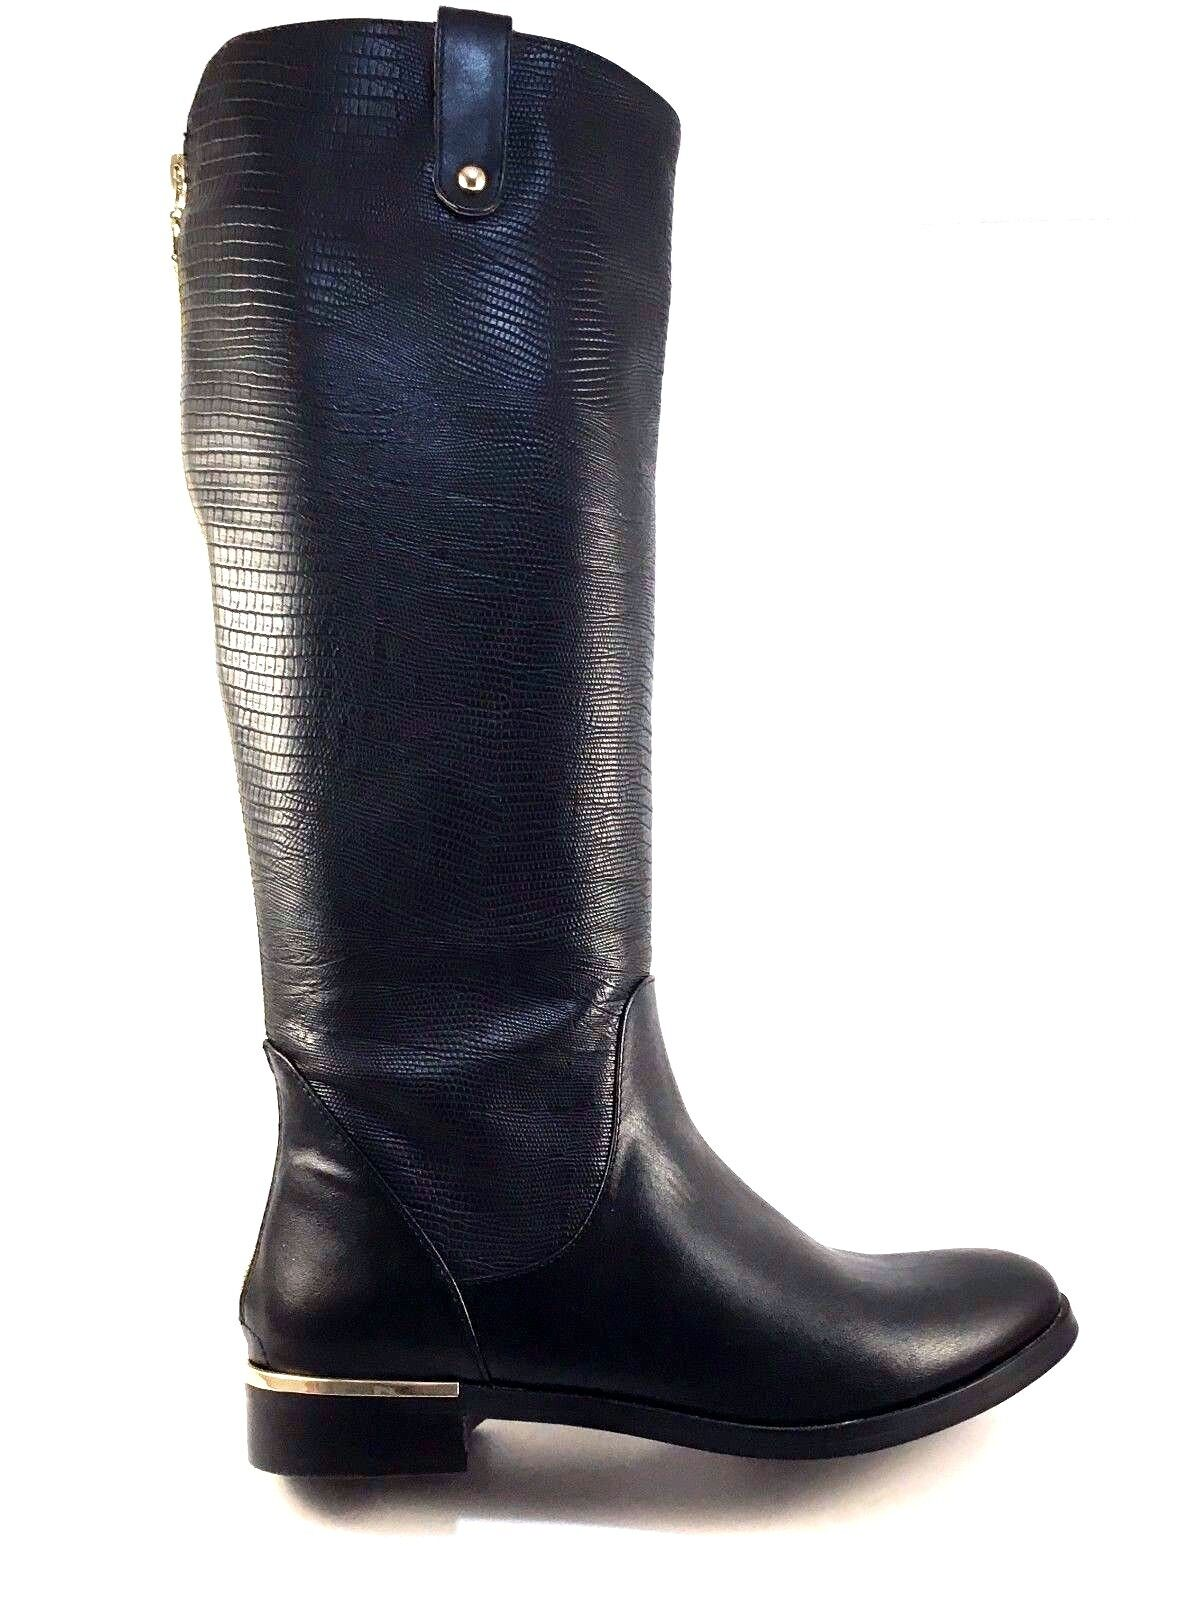 Exe Cristin-510 Black Round Toe Knee High Boots